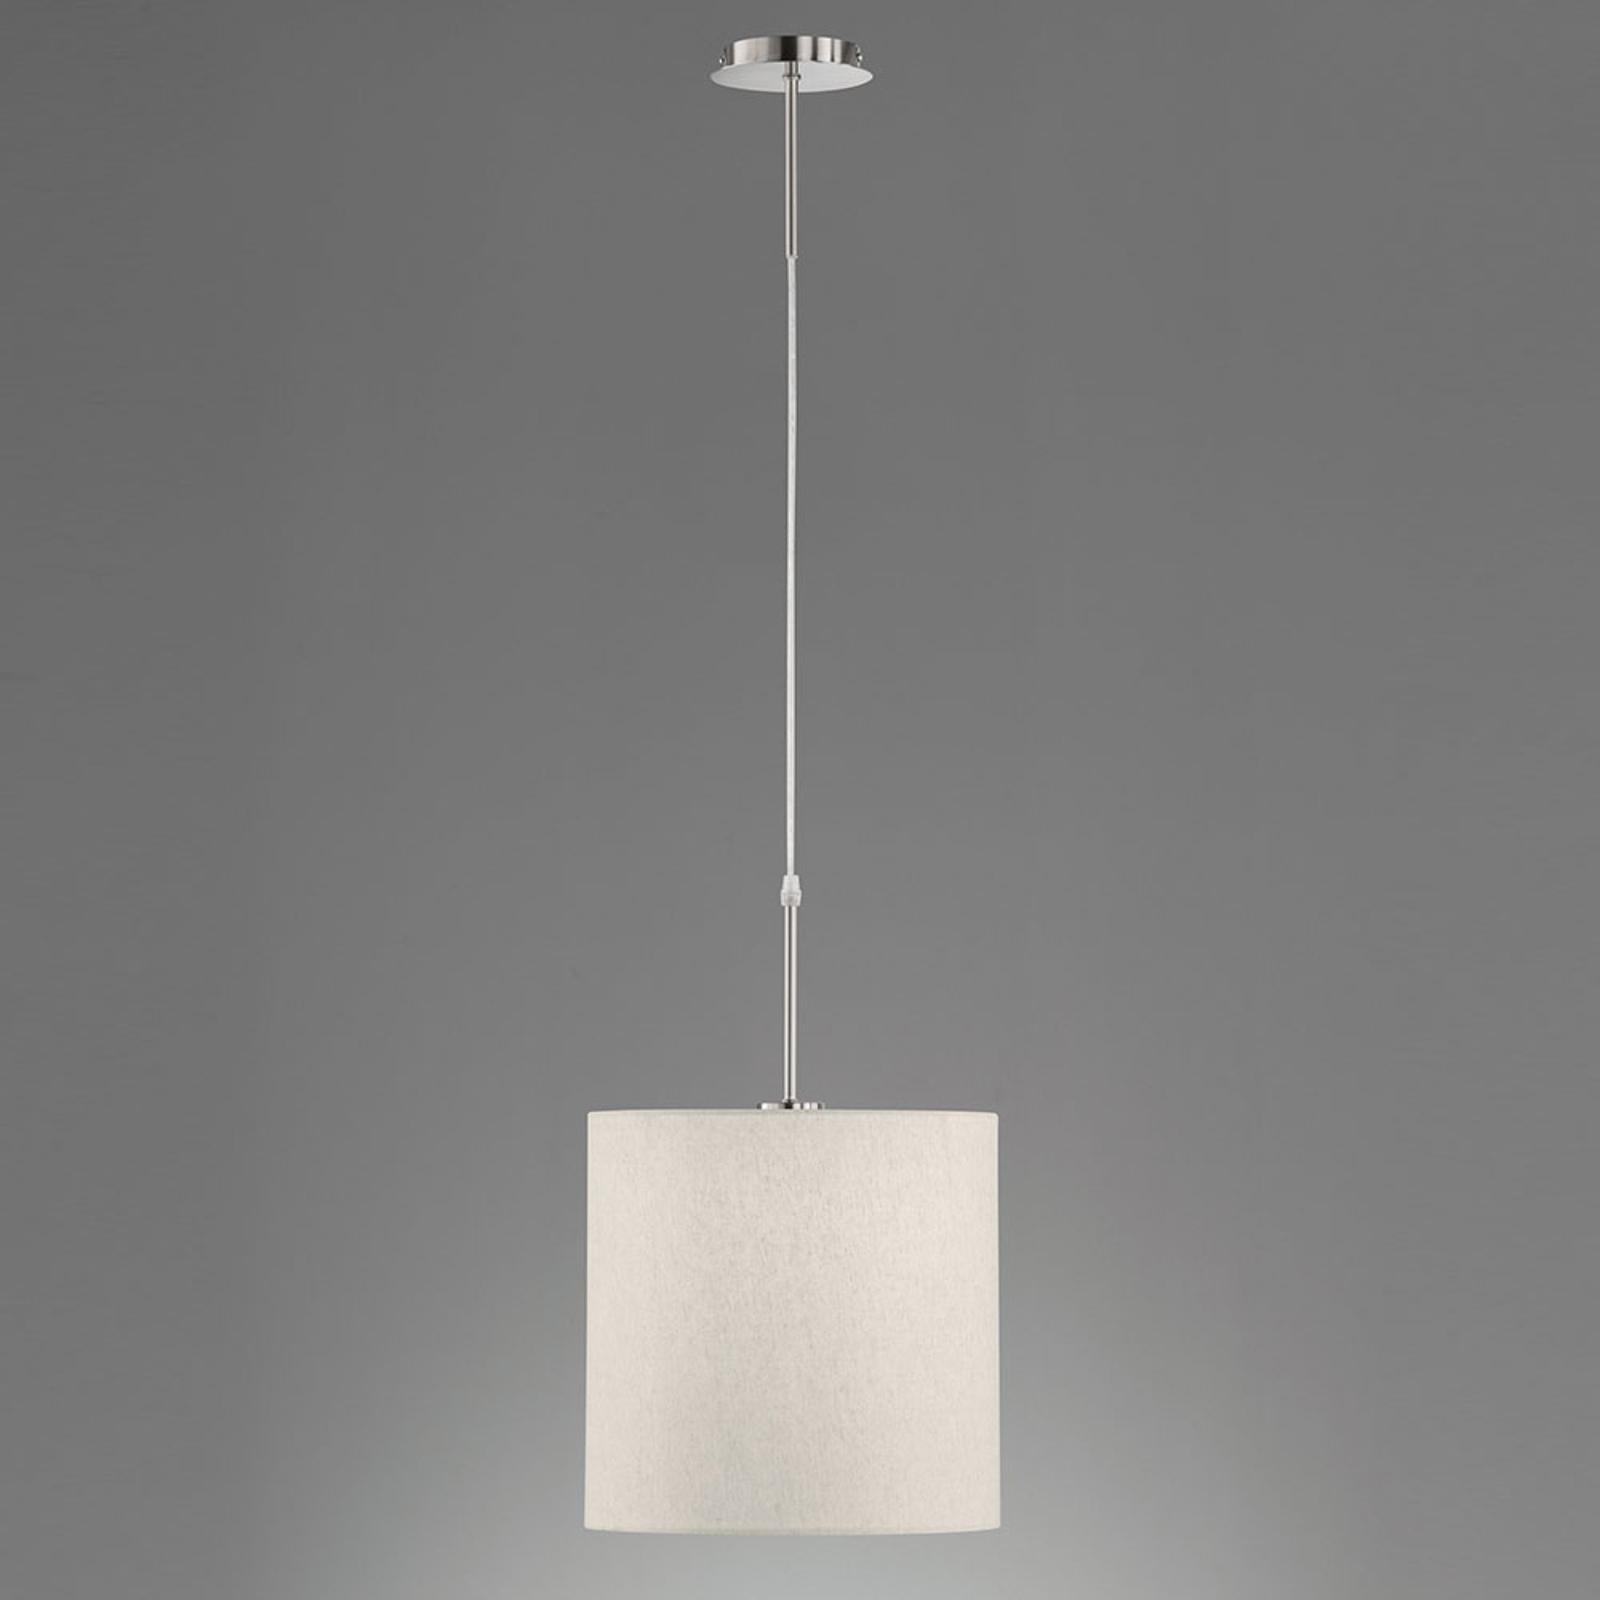 Lampa wisząca Marie, tekstylny klosz, piasek Ø30cm